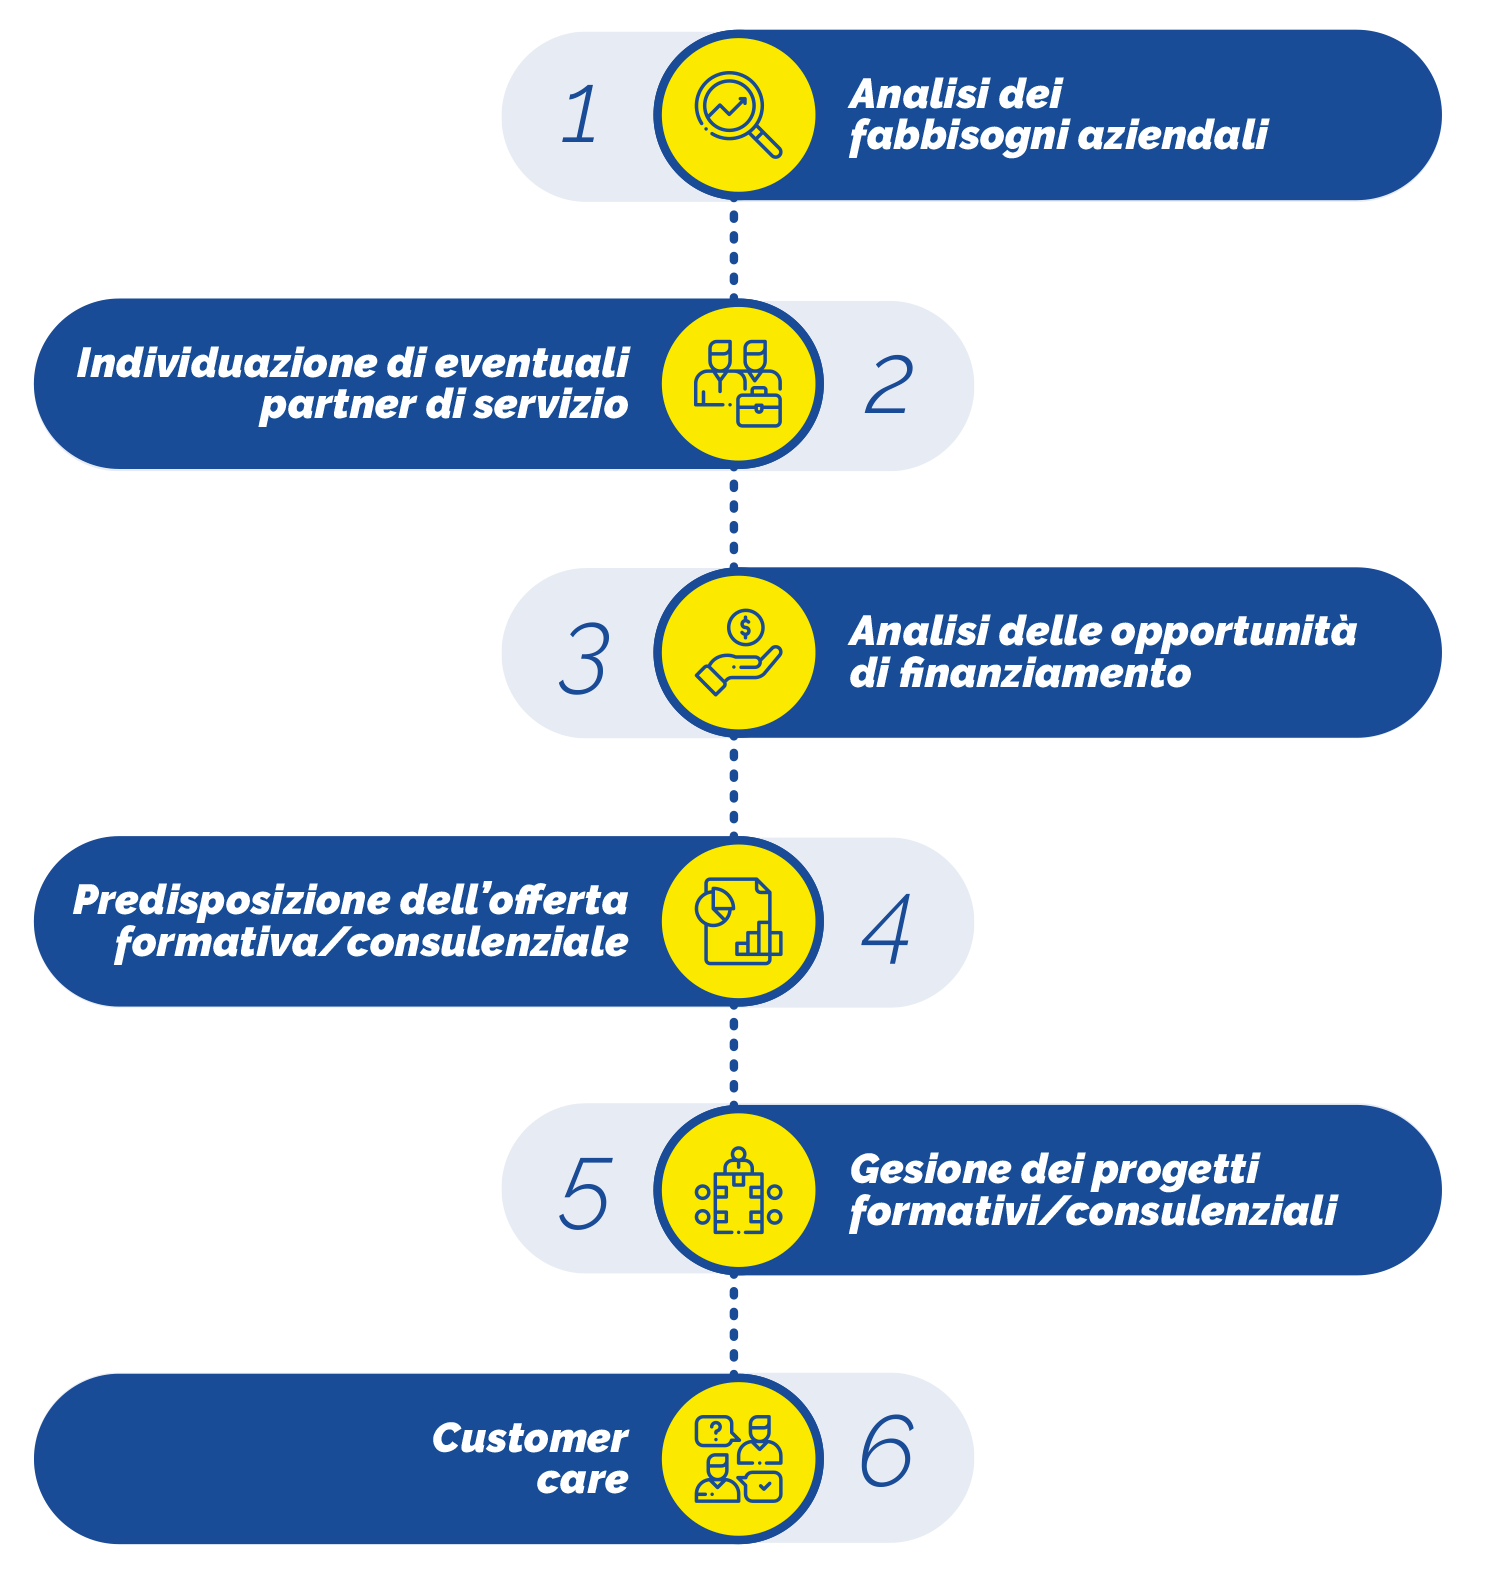 COSEFI strategia aziendale-modalità operative e punti distintivi